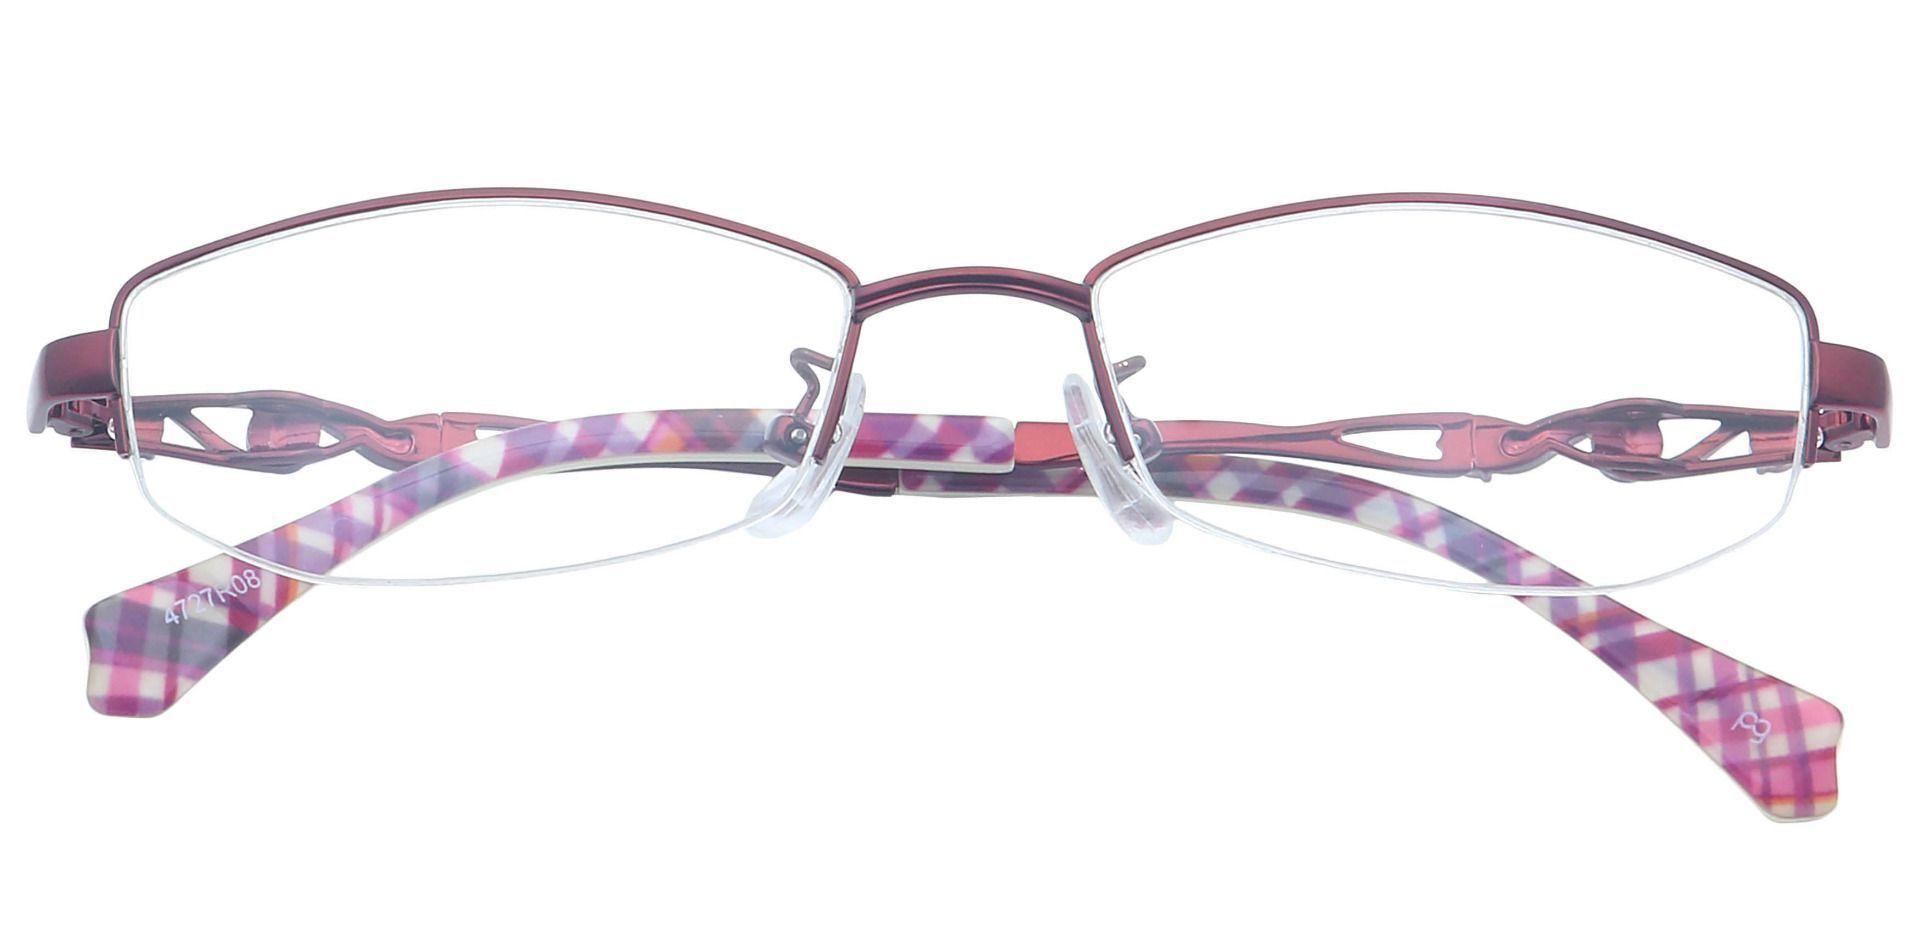 Arden Rectangle Blue Light Blocking Glasses - Red